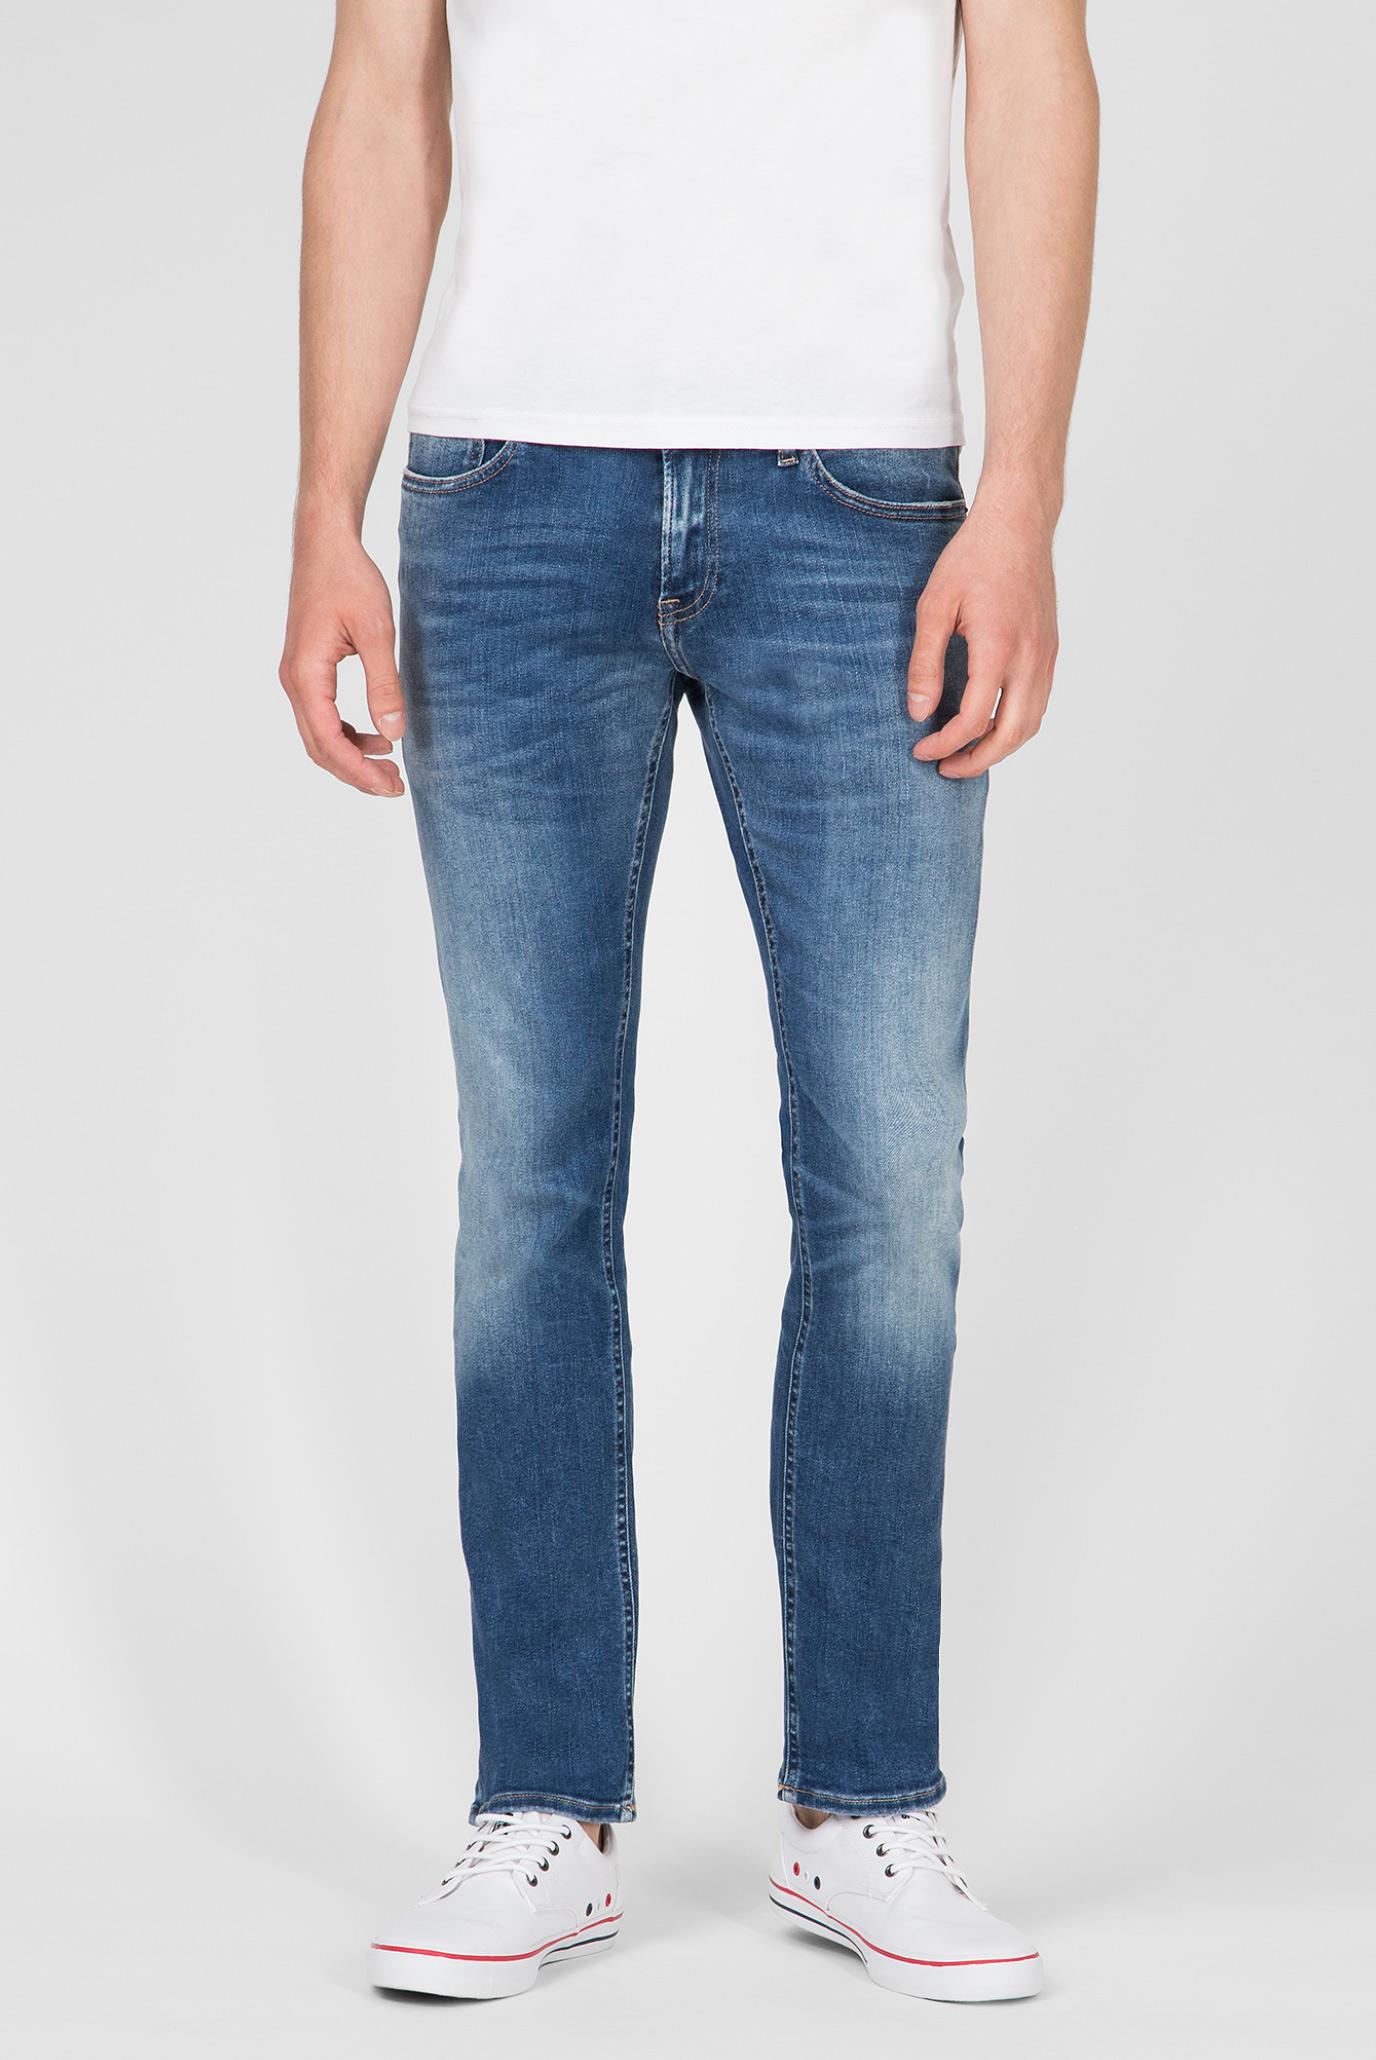 Мужские синие джинсы SLIM SCANTON Tommy Hilfiger DM0DM06124 — MD-Fashion, баркод 8719857491962